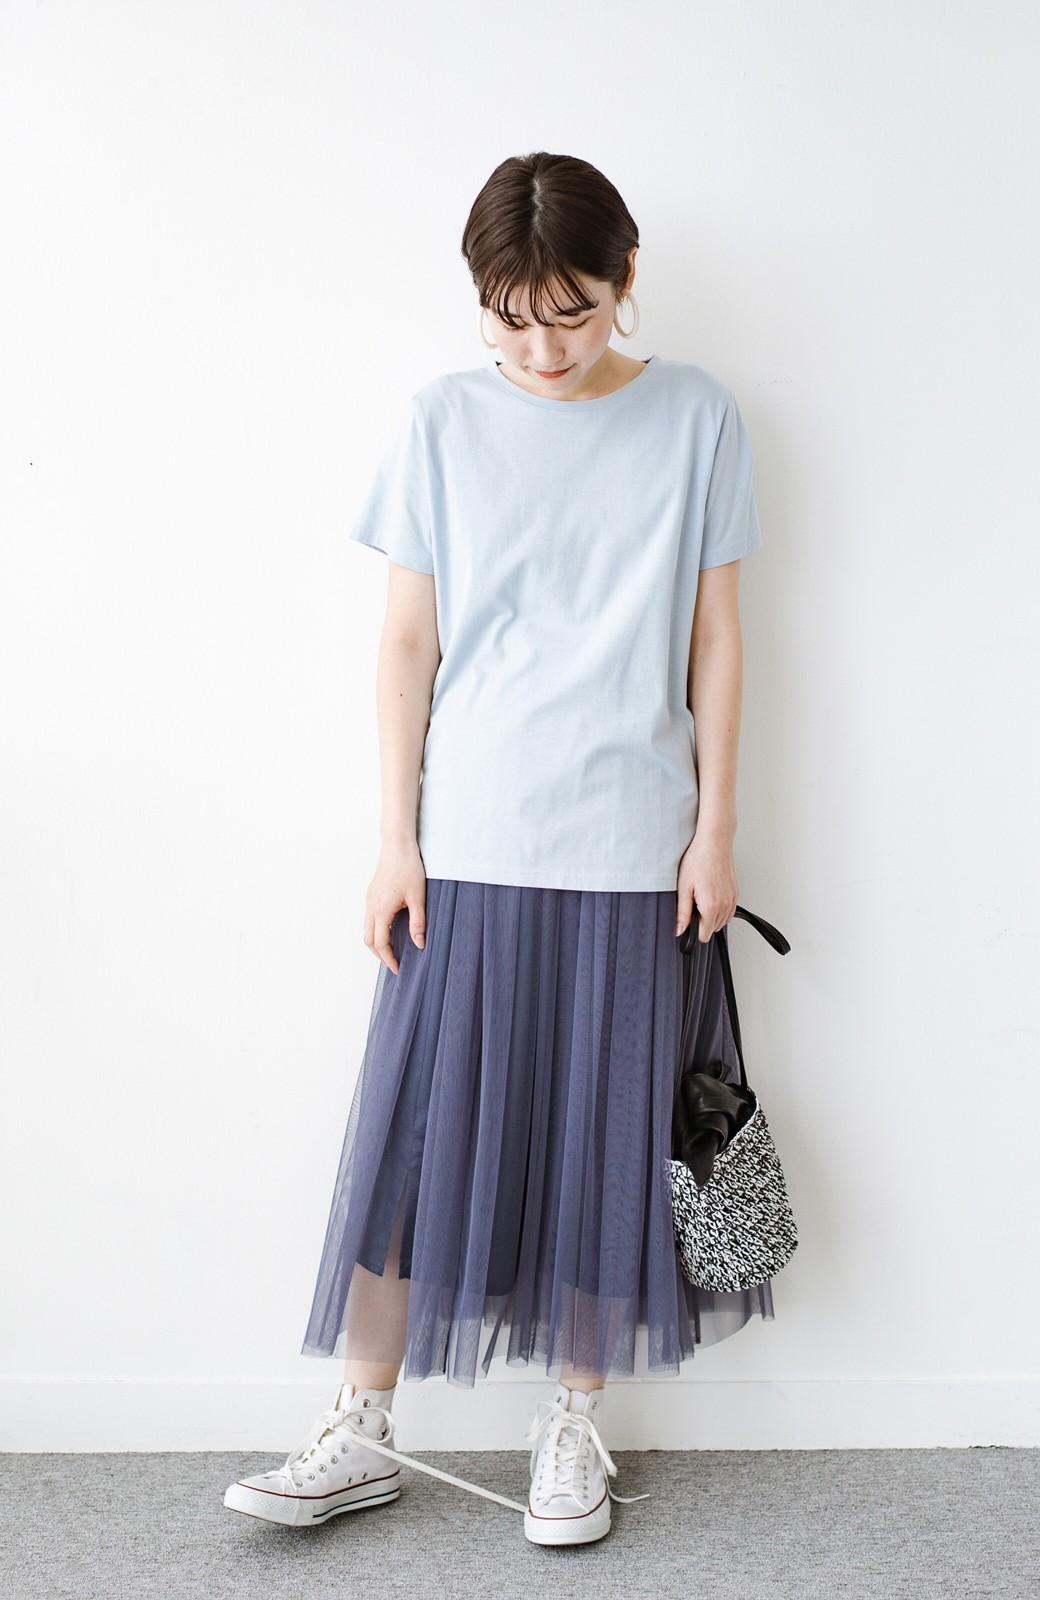 haco! 汗染み軽減加工で安心!1枚でも重ね着にも便利なシンプルTシャツ by ZAMPA <サックスブルー>の商品写真4